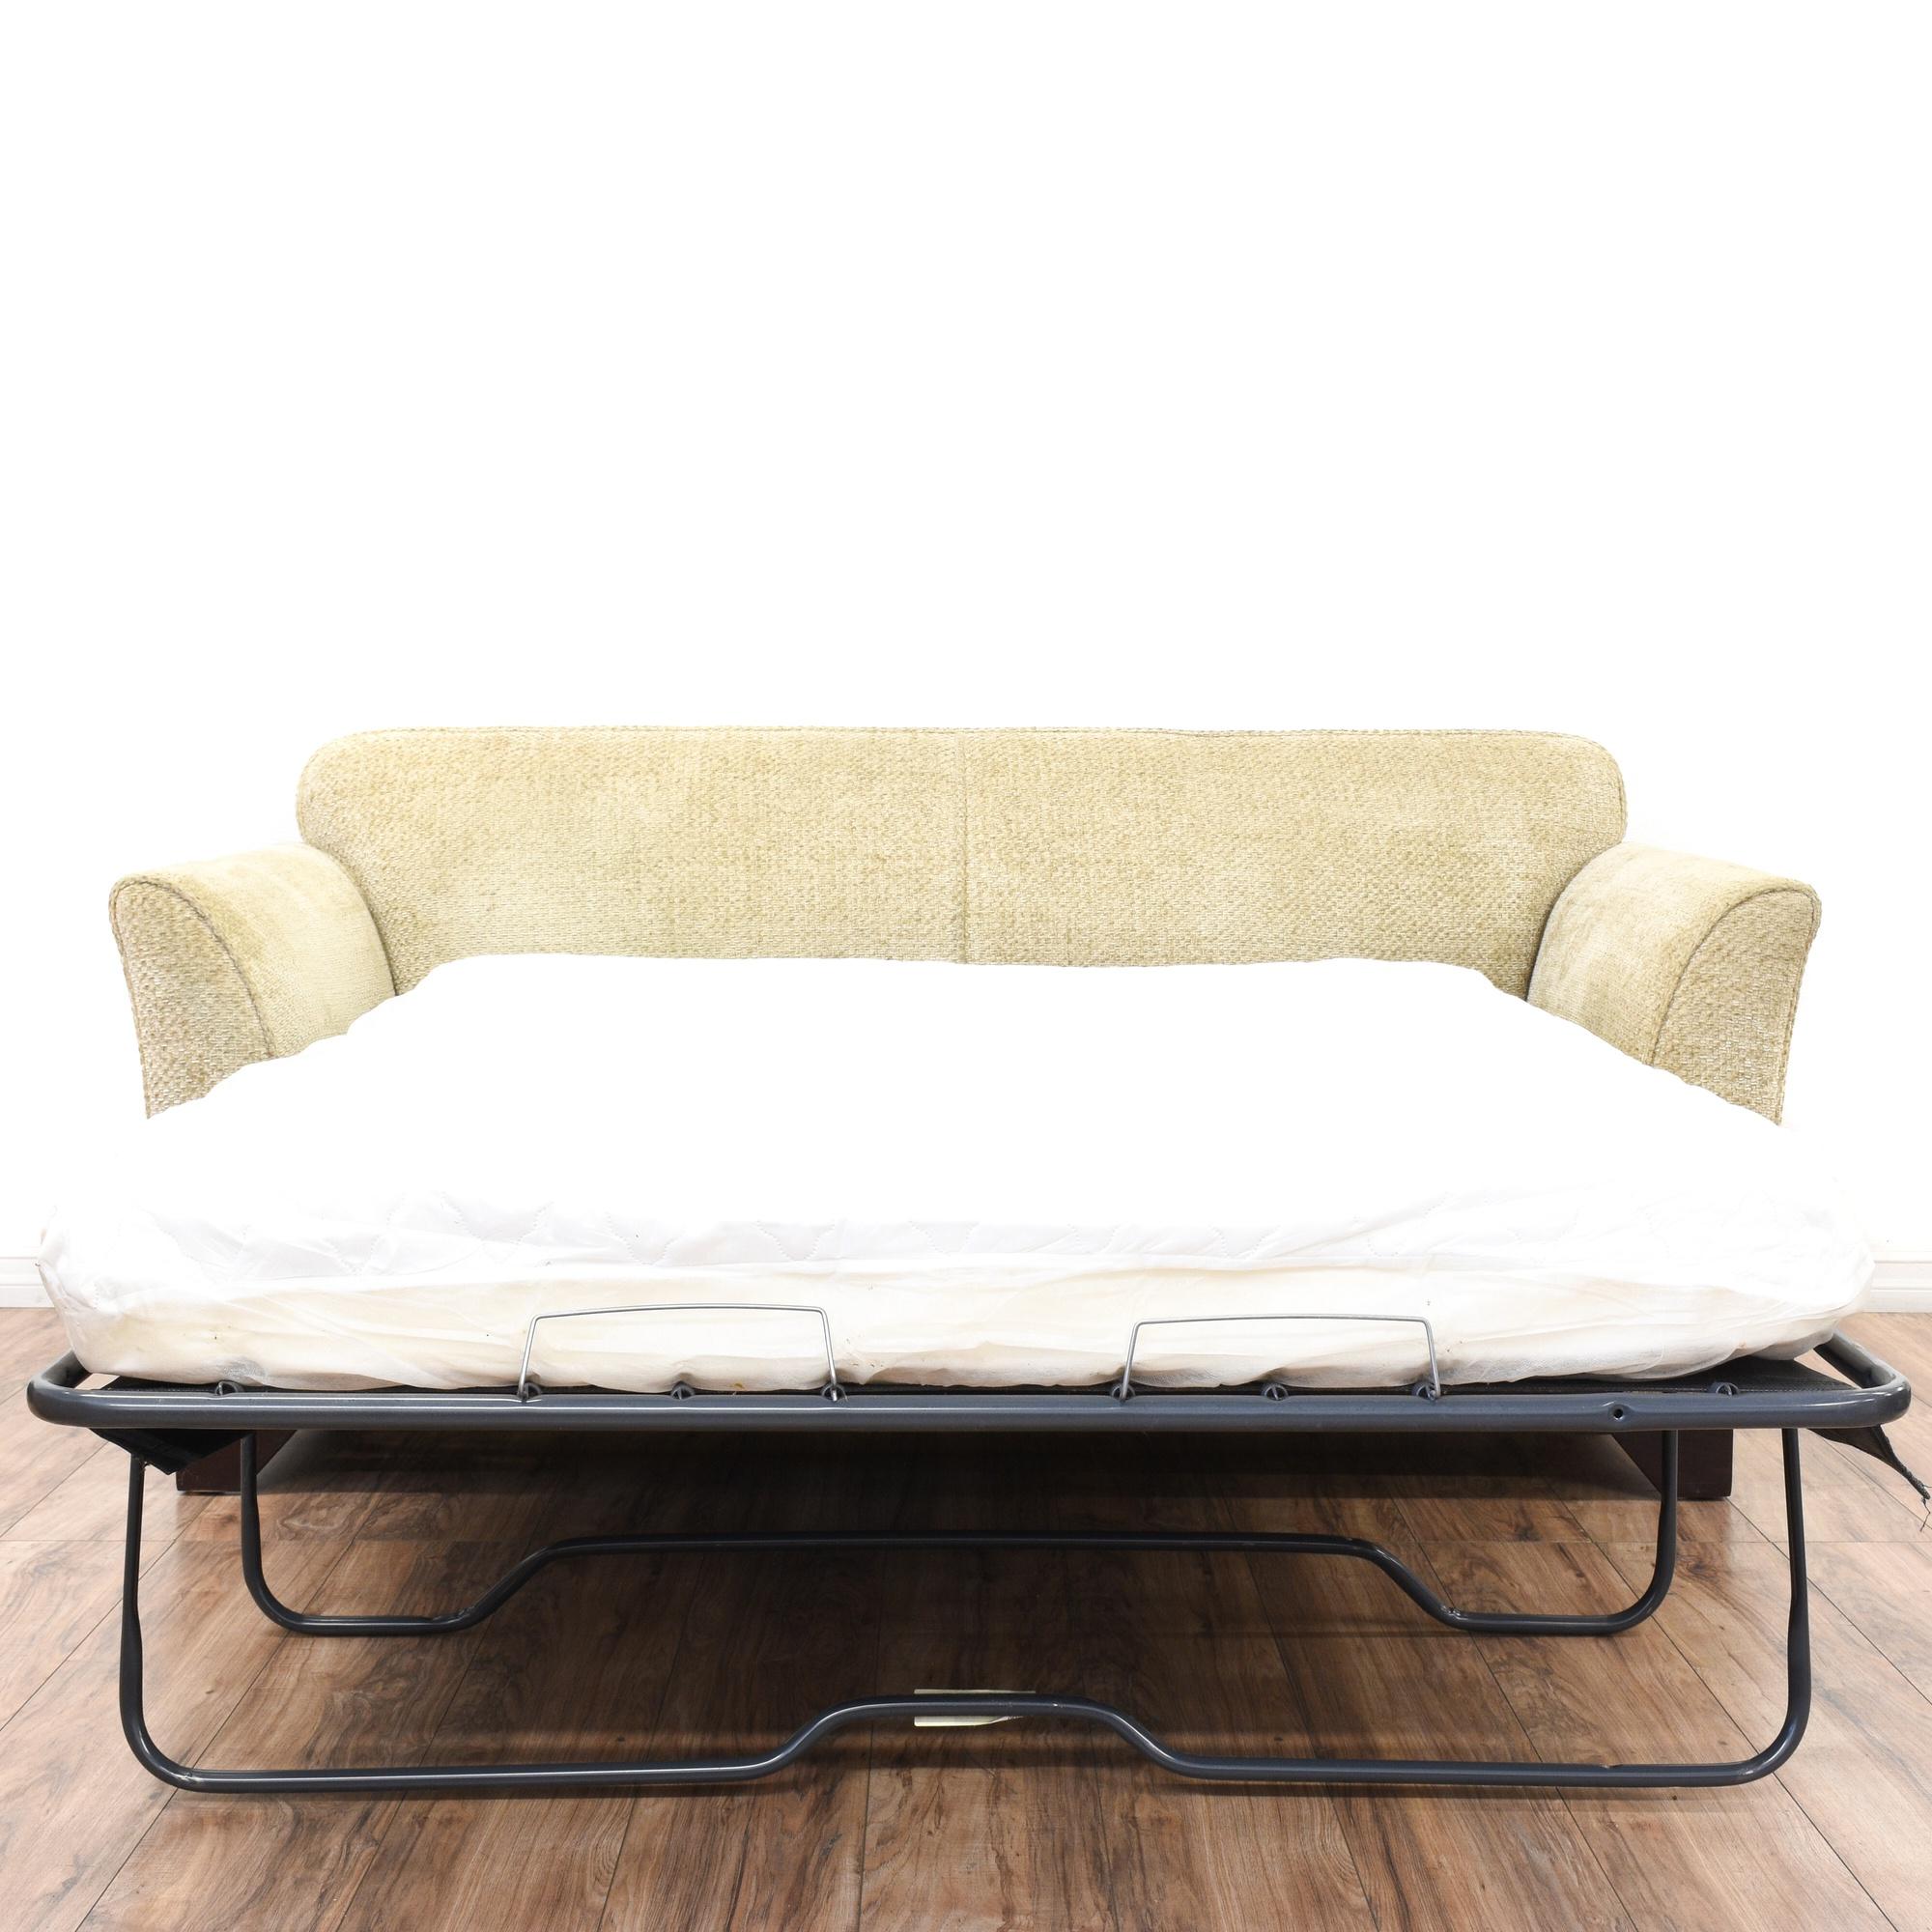 Sleeper Sofa San Francisco: Loveseat Vintage Furniture San